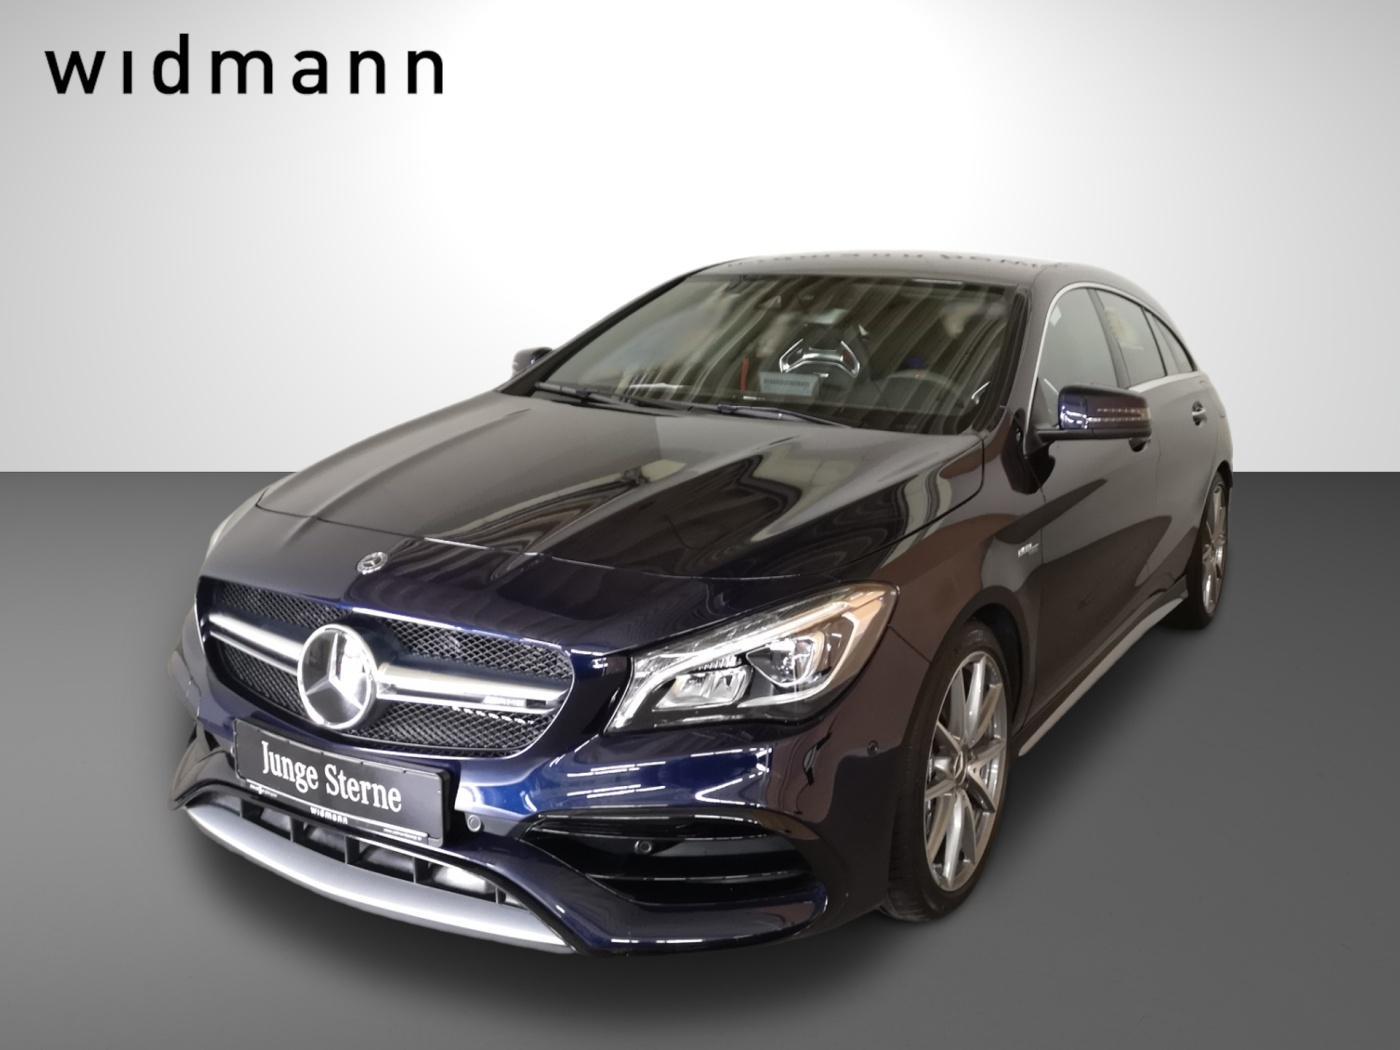 Mercedes-Benz CLA 45 AMG 4M SB Perf.-AbGas*Nav, Jahr 2018, Benzin